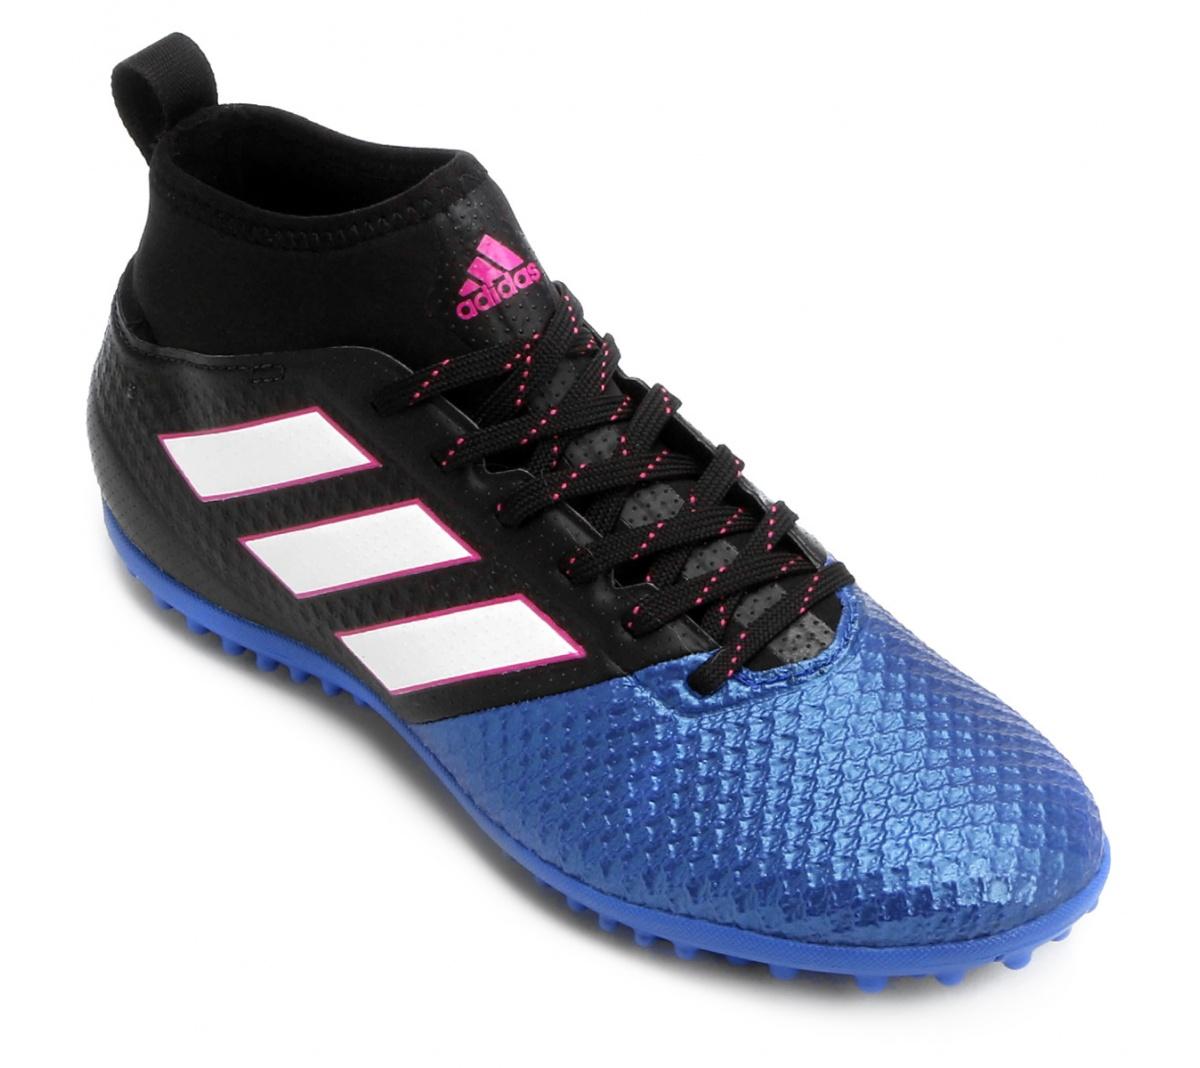 59ff719335f Chuteira Adidas Ace 17.3 PRIMEMESH Society Chuteira Adidas Ace 17.3  PRIMEMESH Society ...